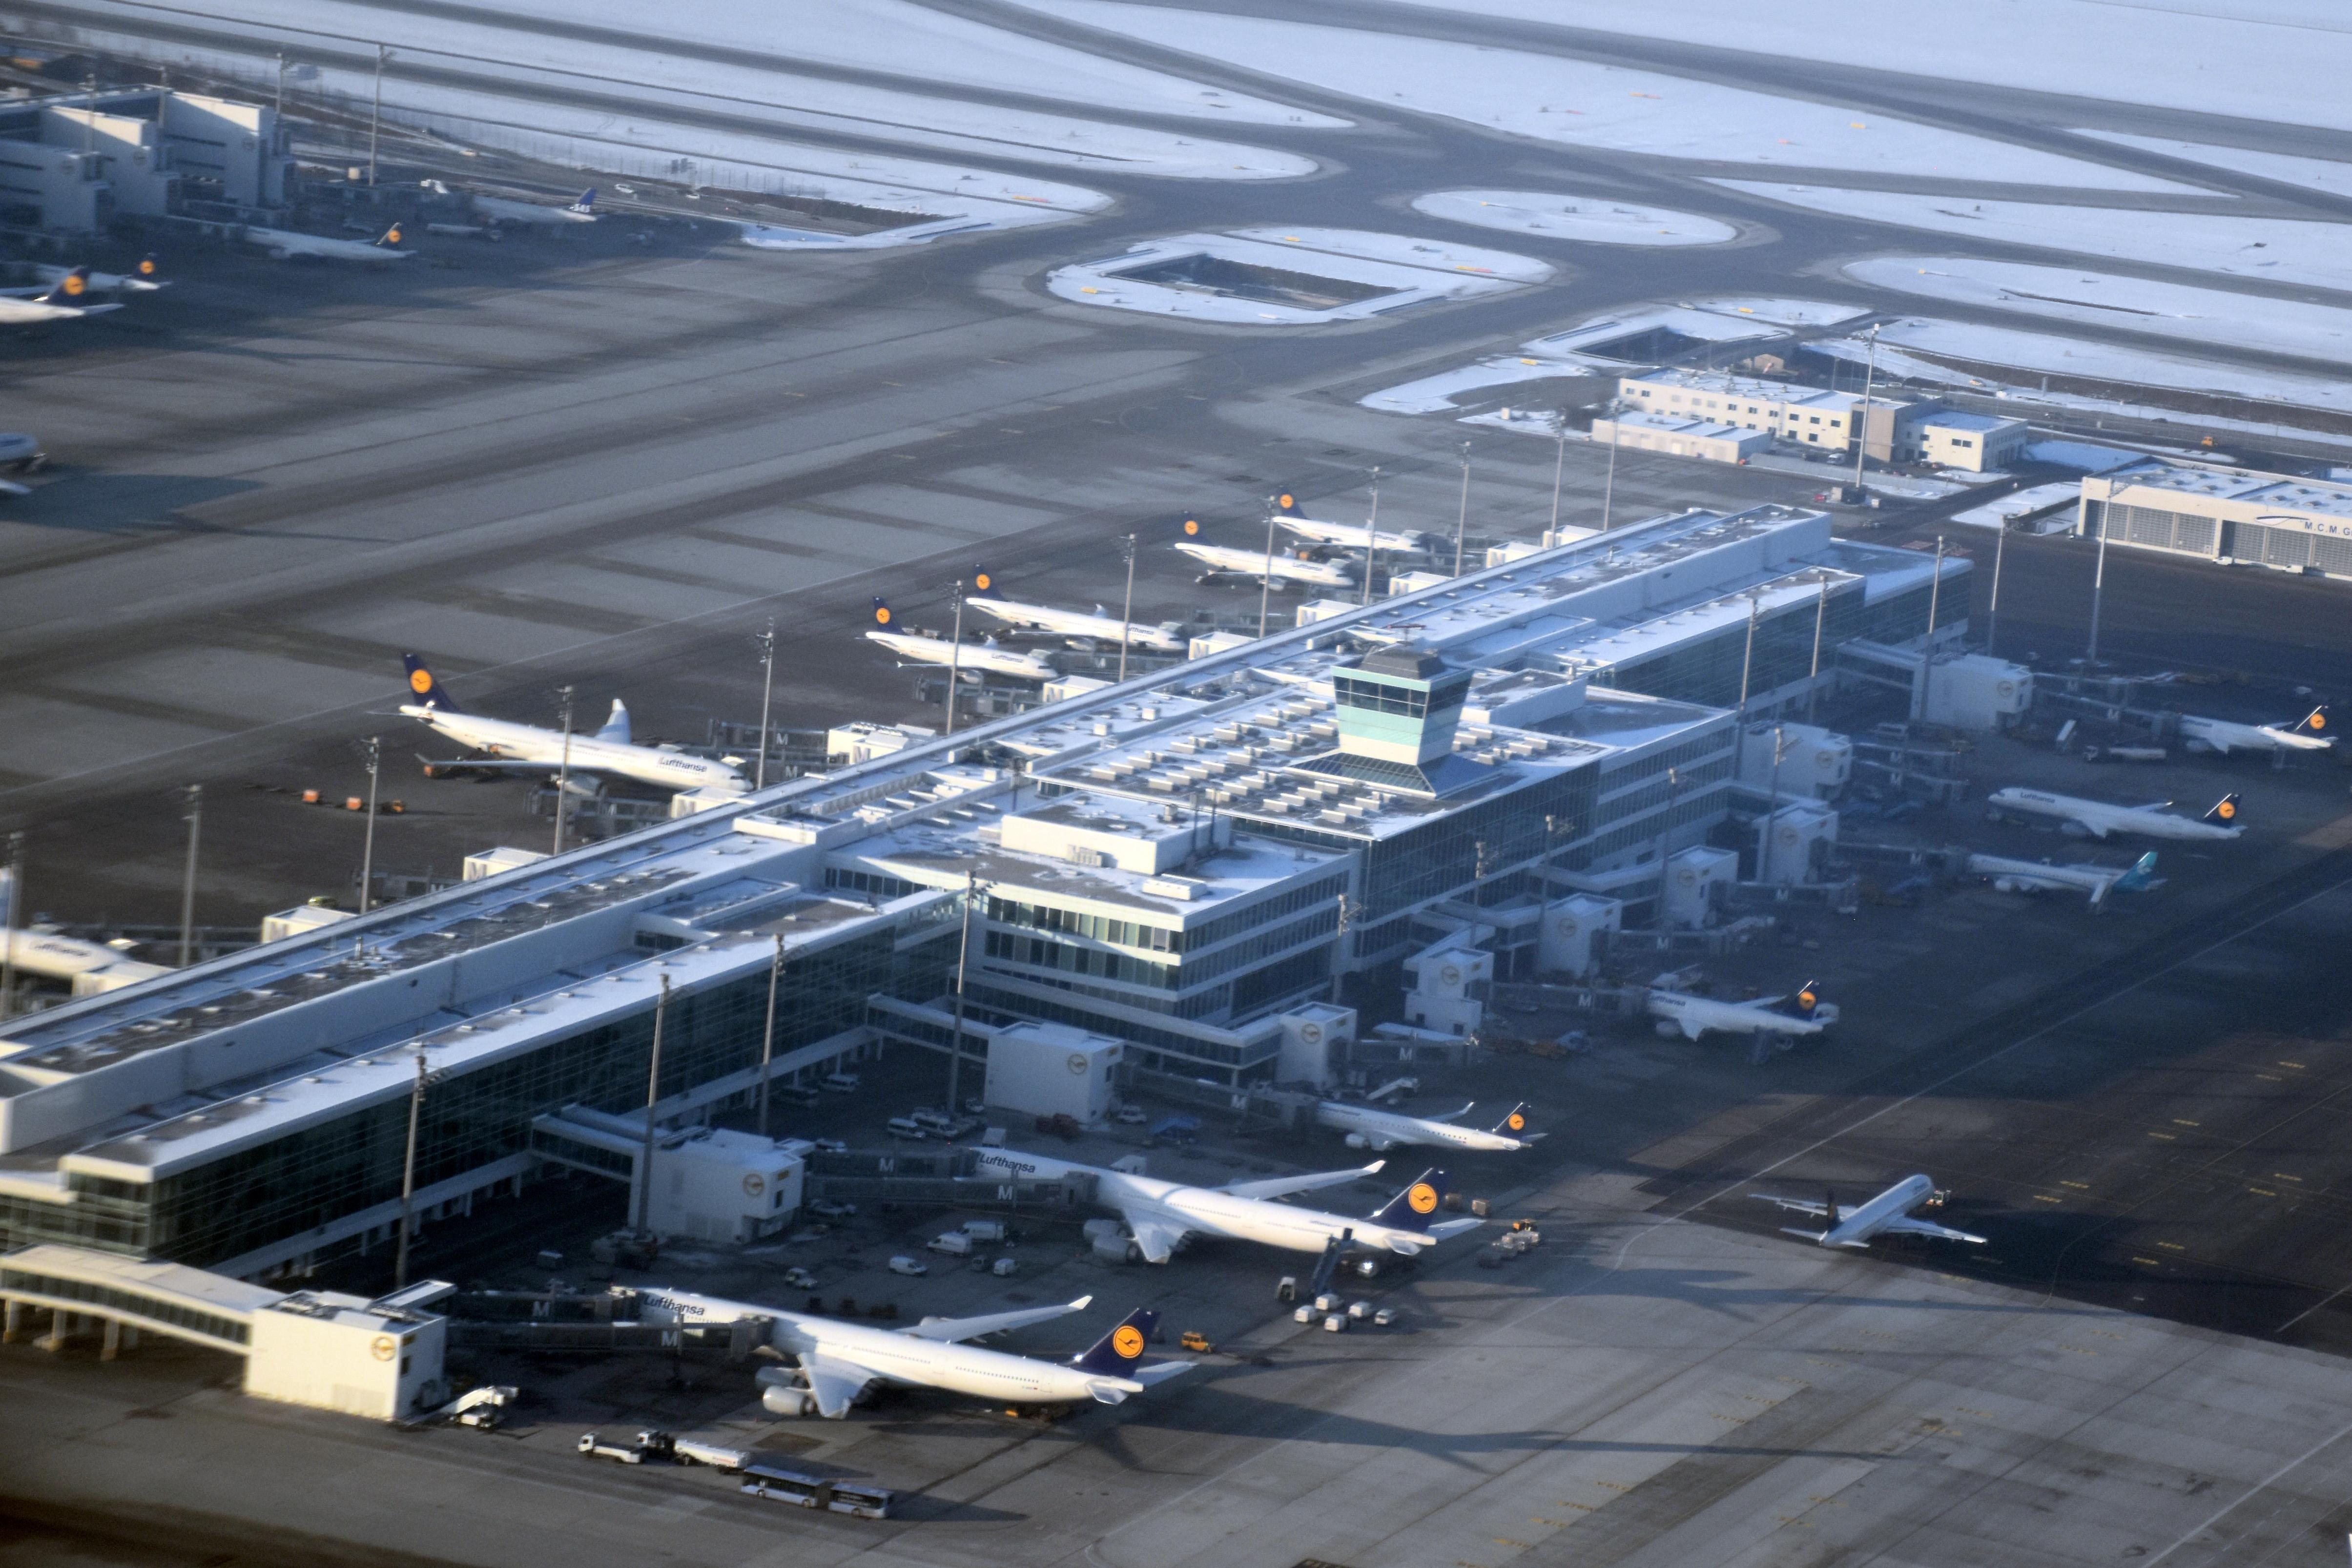 Аэропорт Мюнхена терминал 2 спутник фото